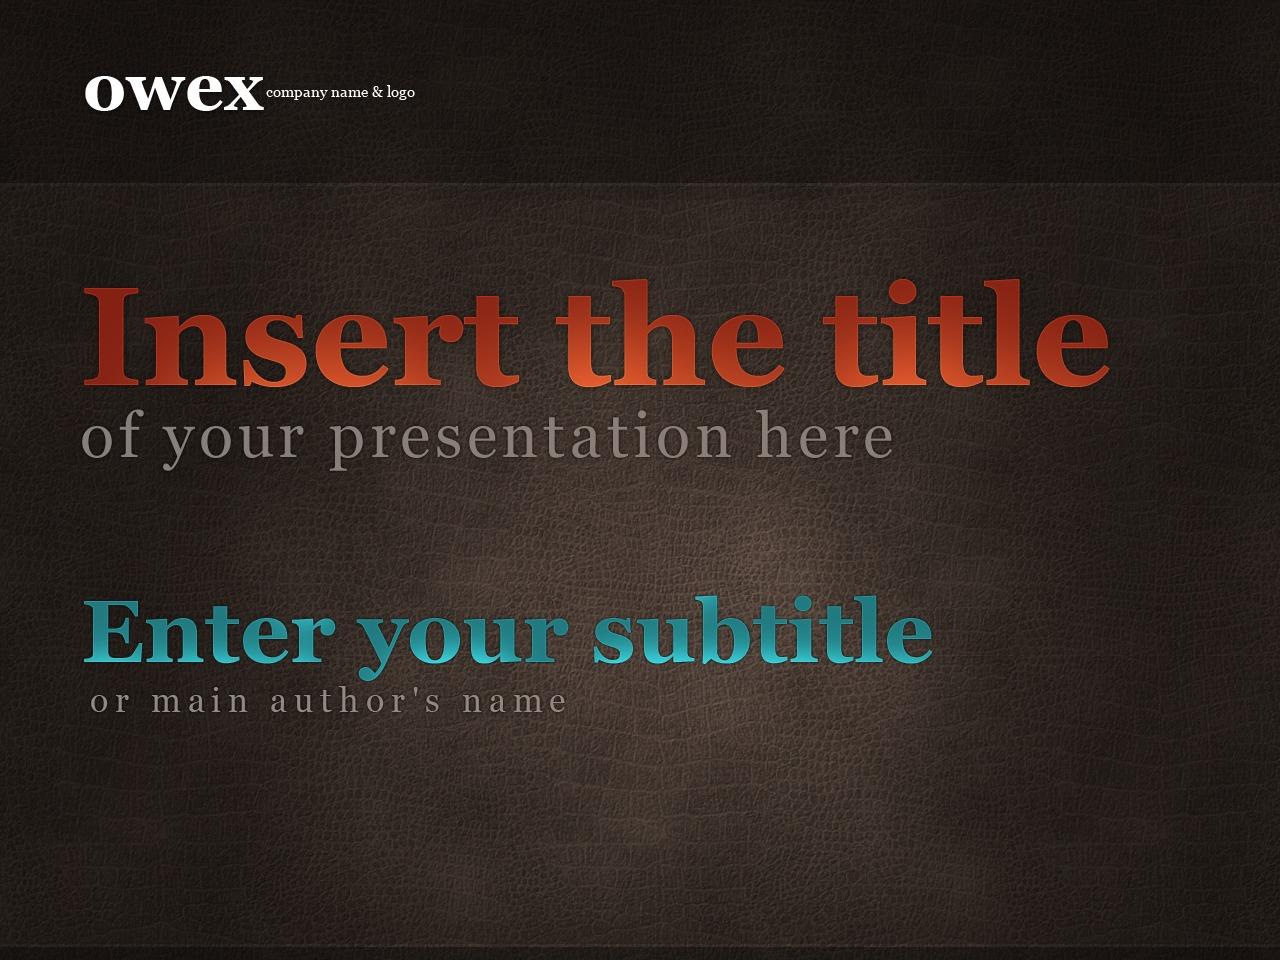 PowerPoint шаблон №24222 на тему бизнес и услуги